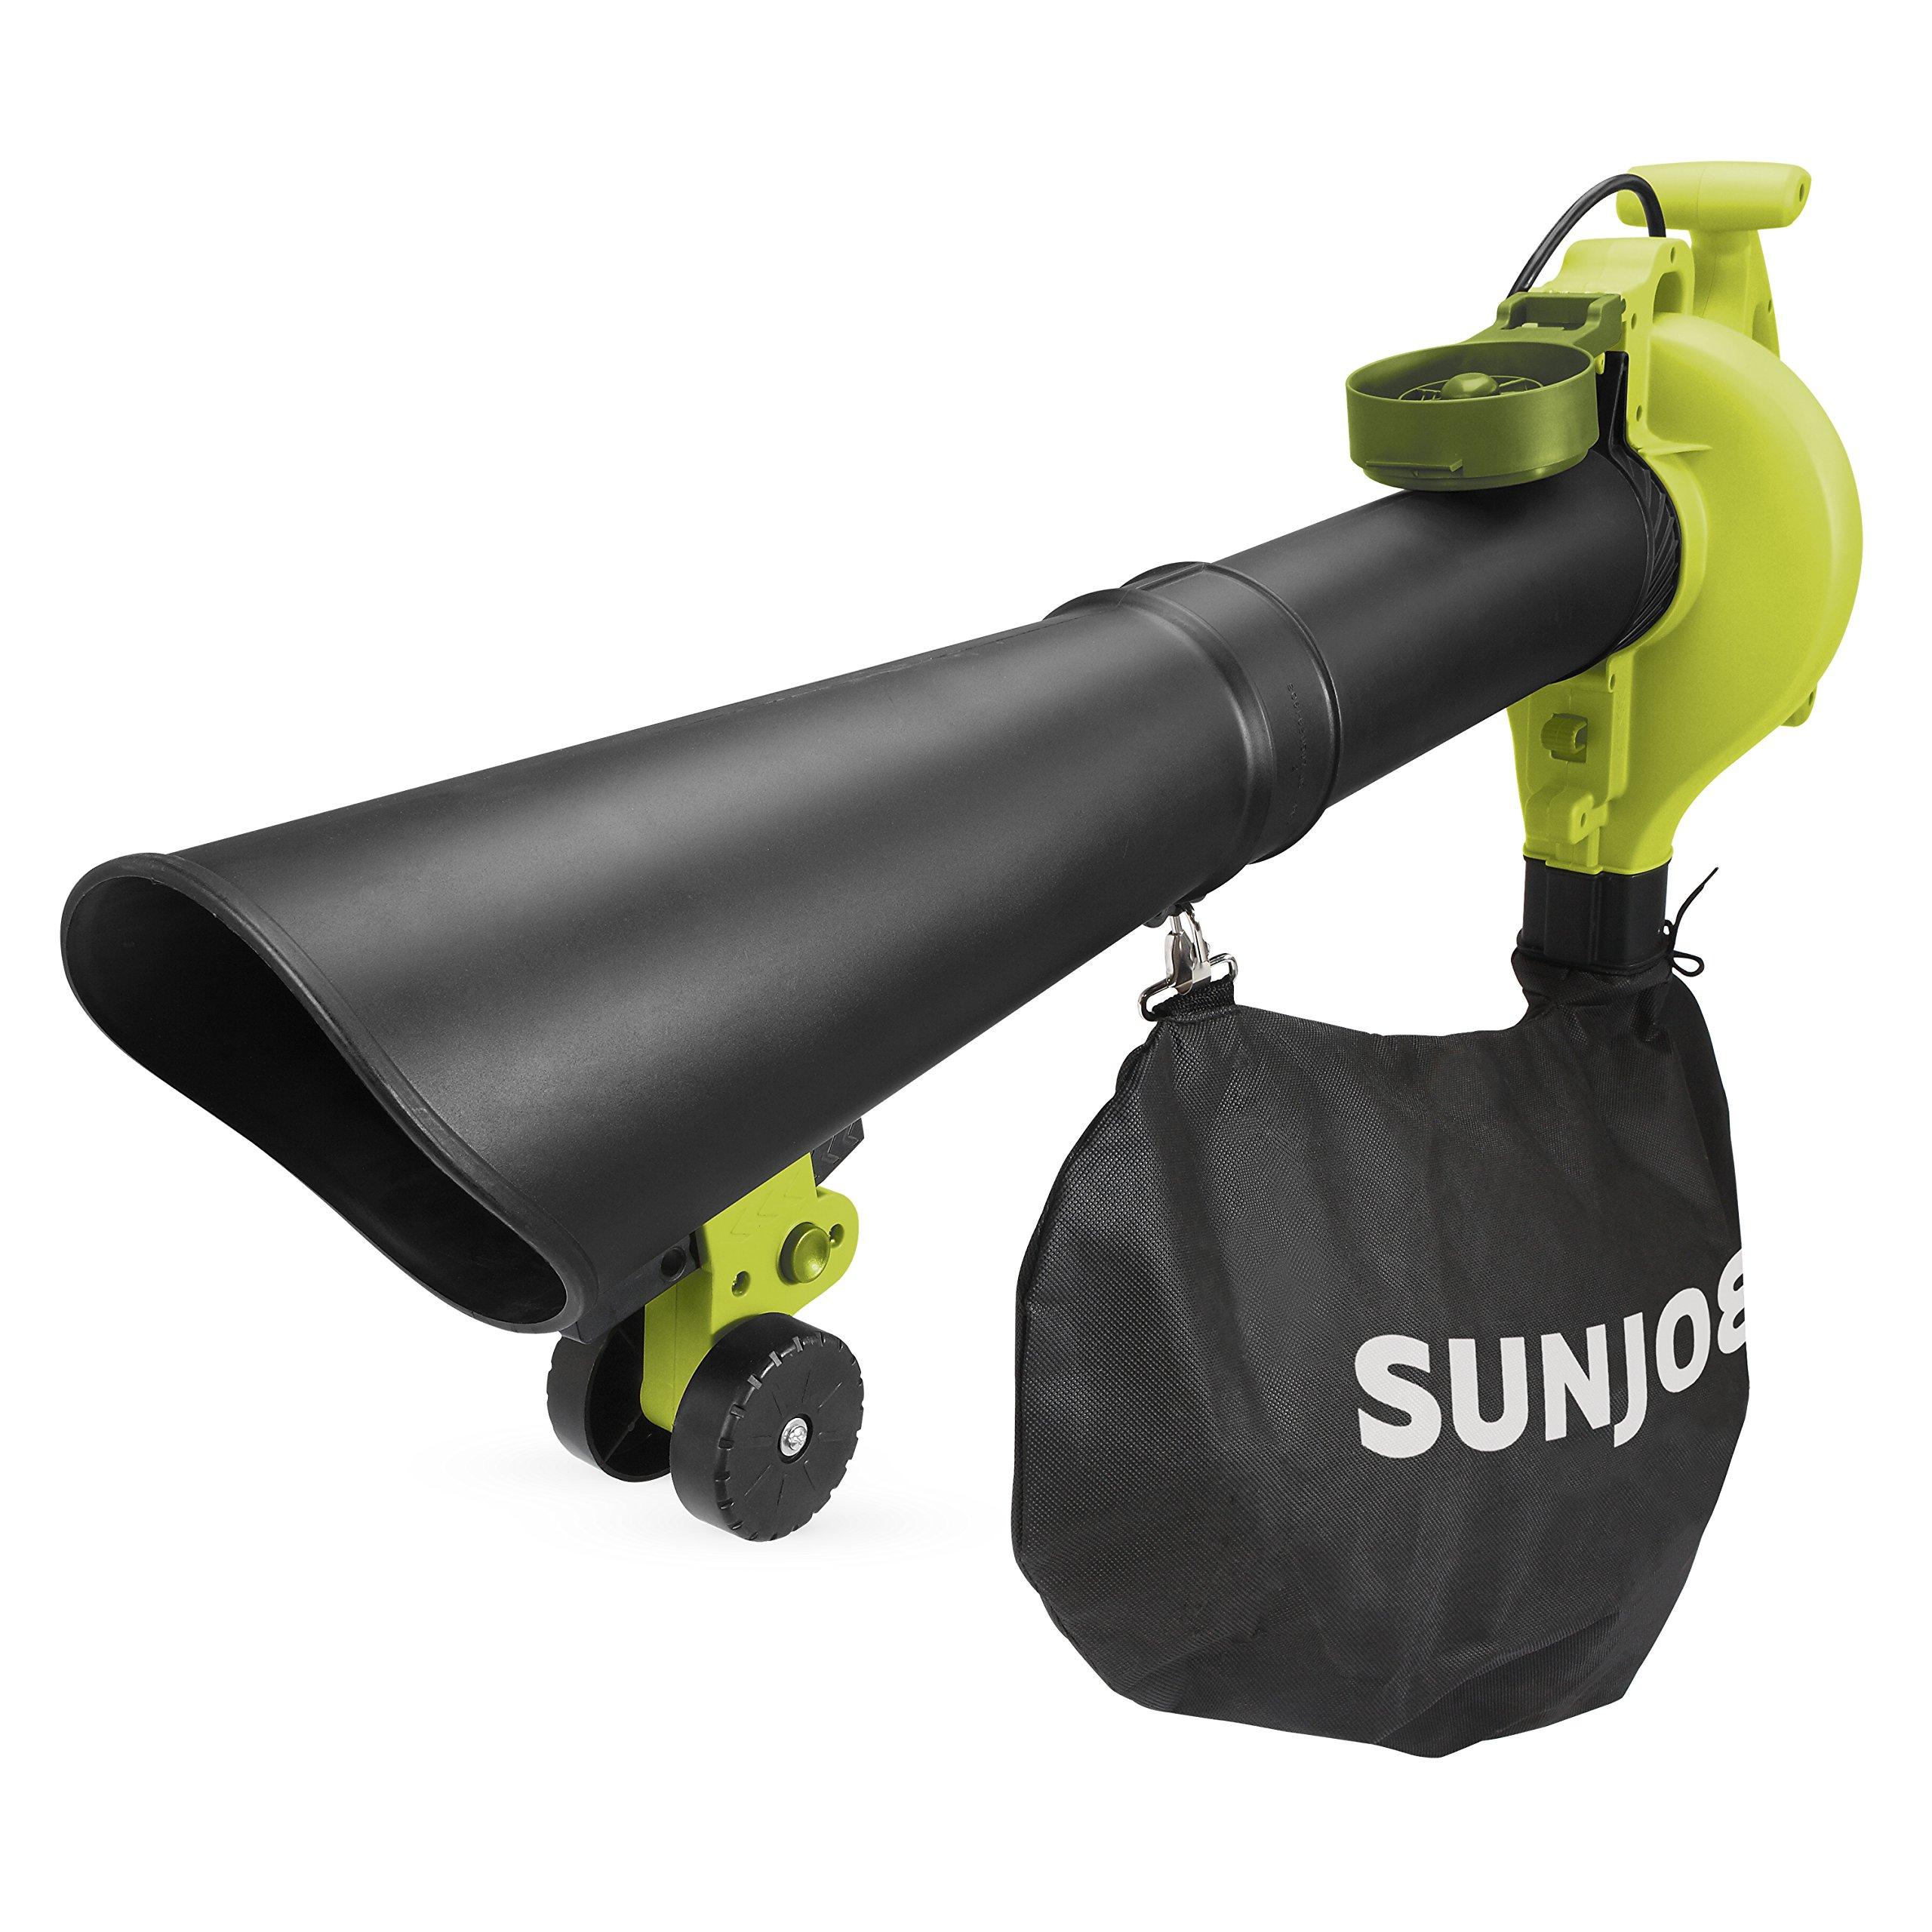 Sun Joe SBJ606E-GA-SJG 4-in-1 Electric Blower | 250 MPH 14 Amp | Vacuum Mulcher Gutter Cleaner